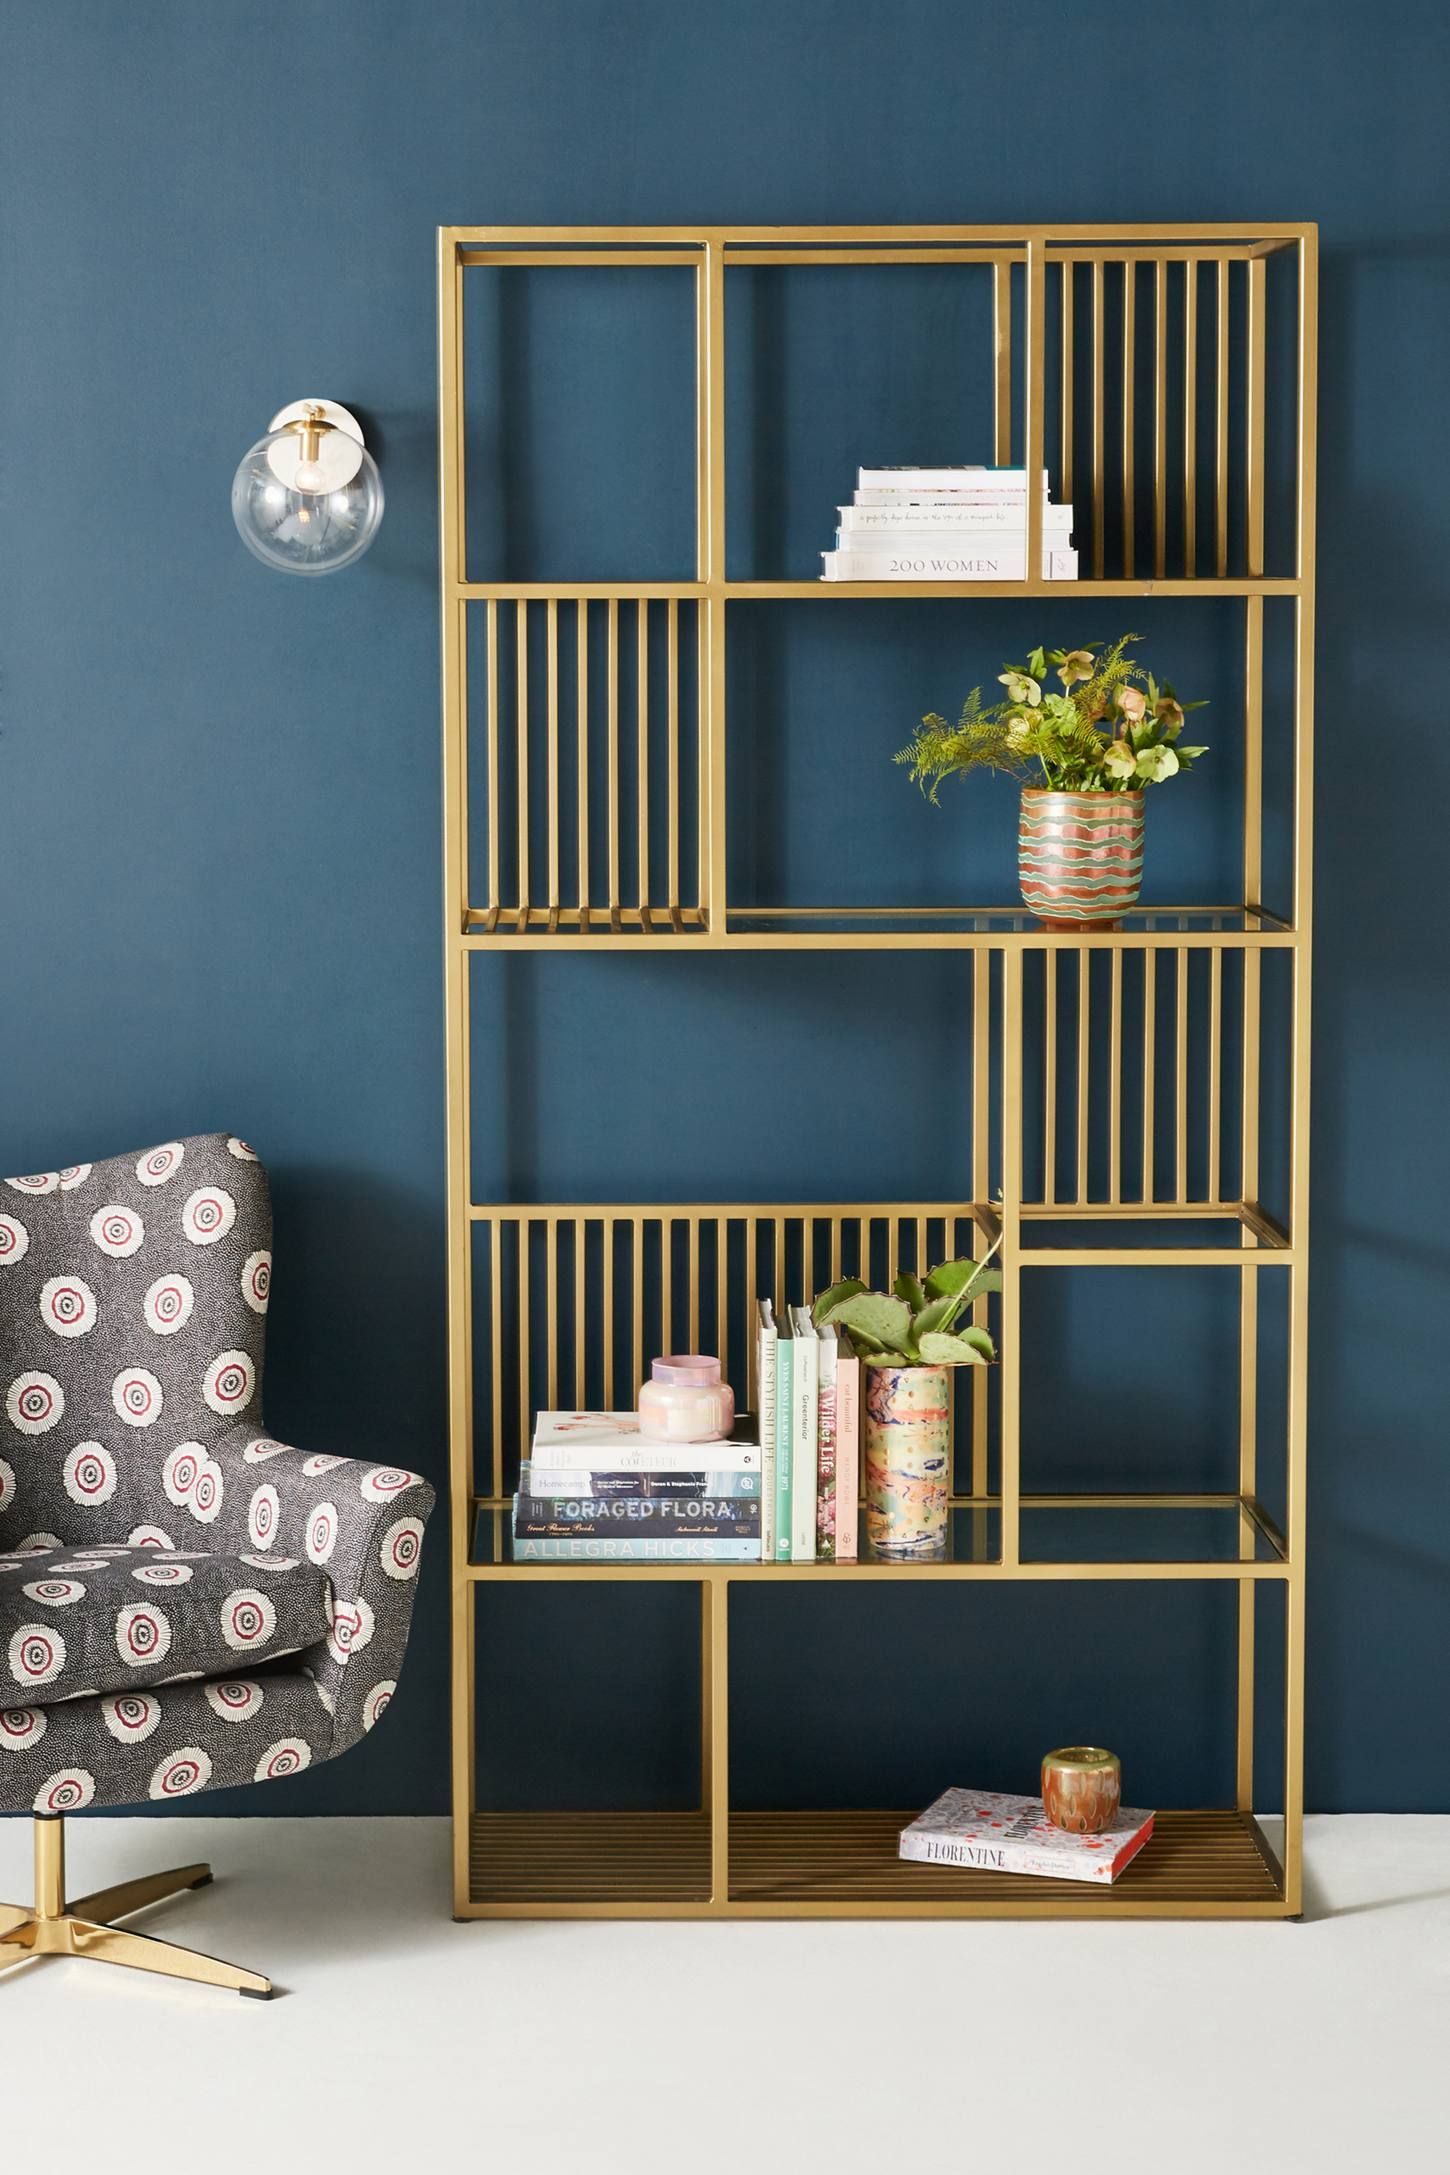 Luxury Showcase For Living Room Royal Art Deco: Unique Living Room Furniture